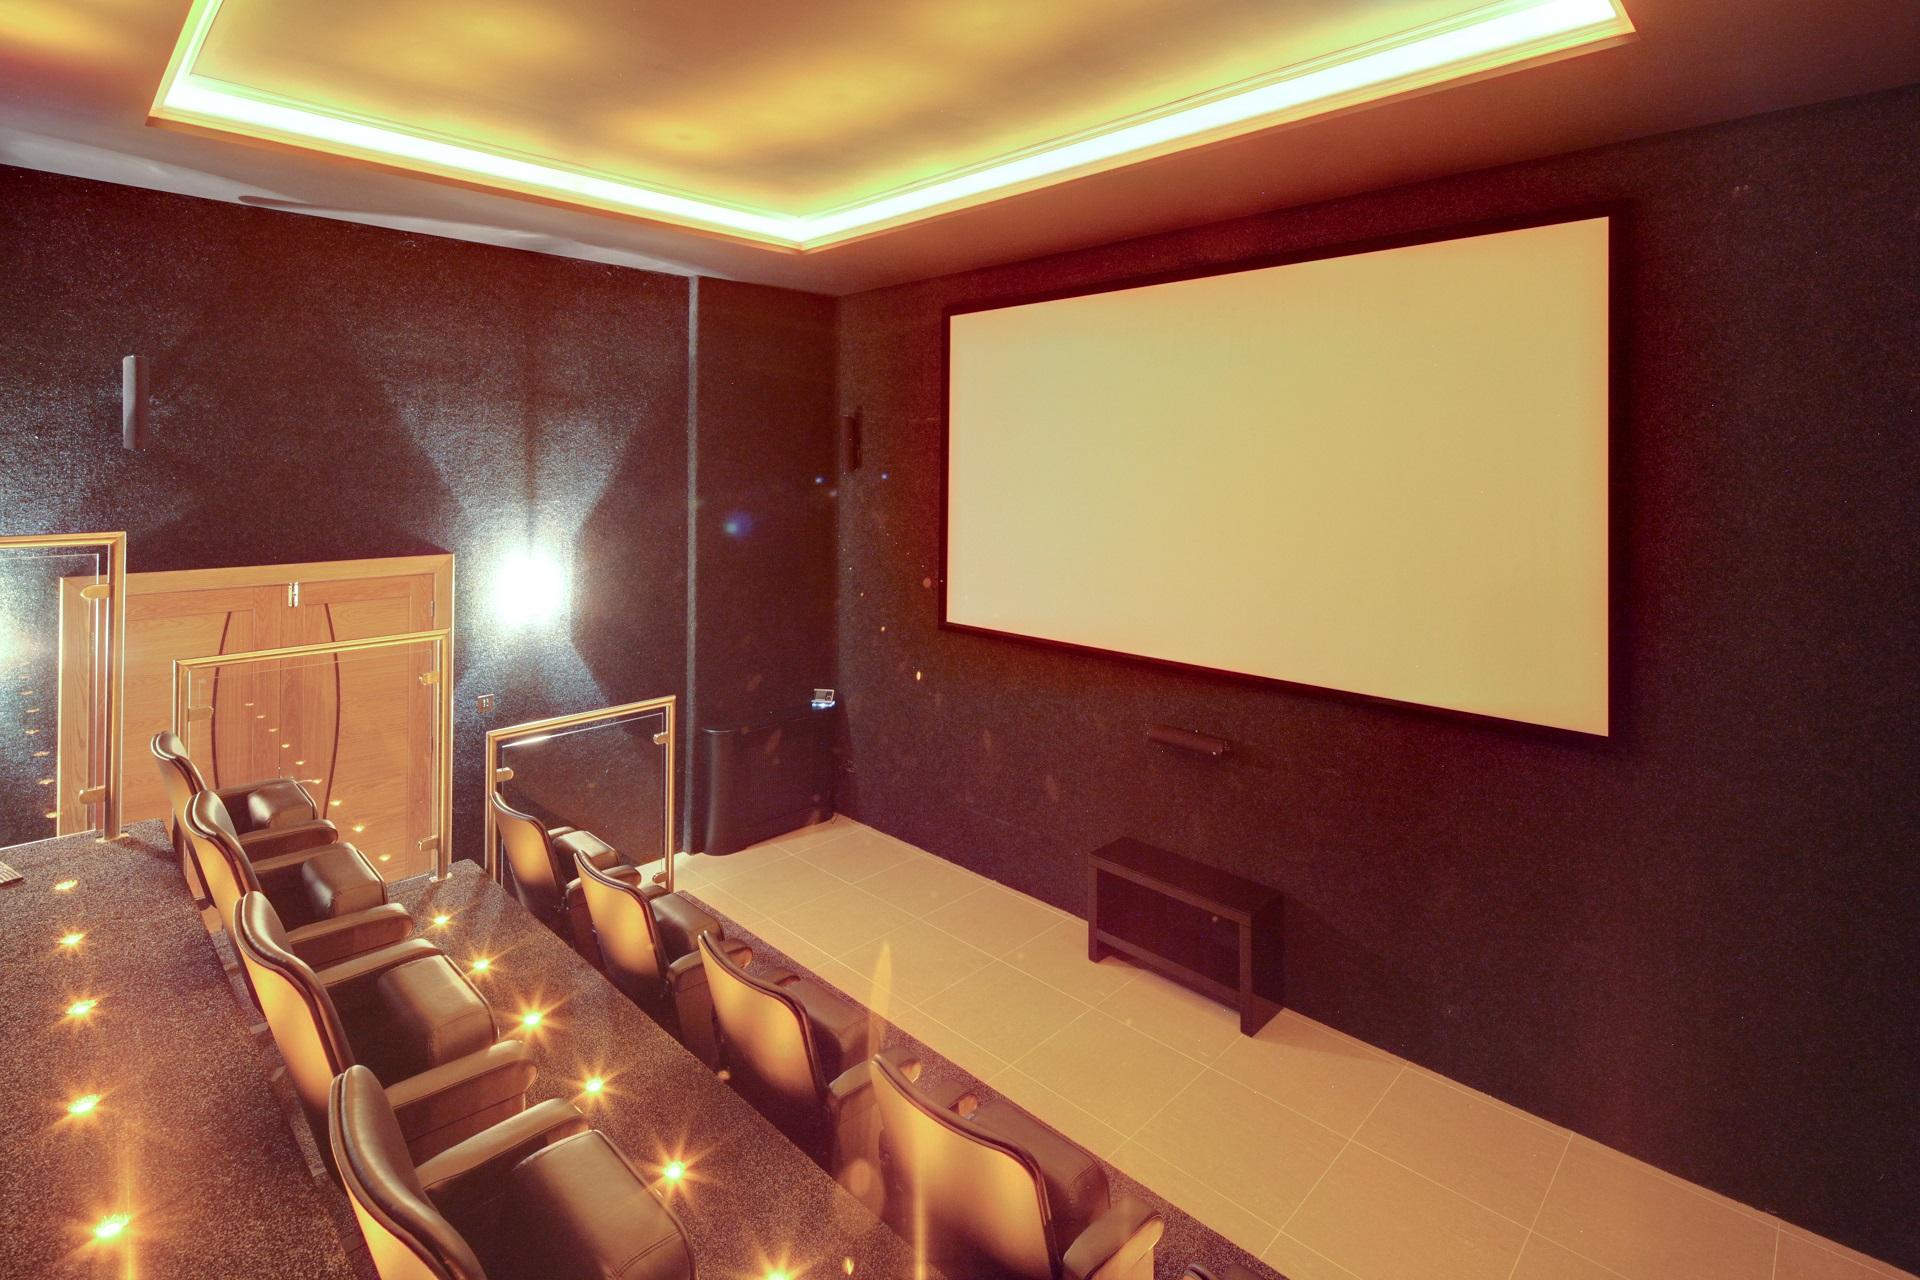 Cinema Room at Hall View, luxury bespoke home by Guy Phoenix